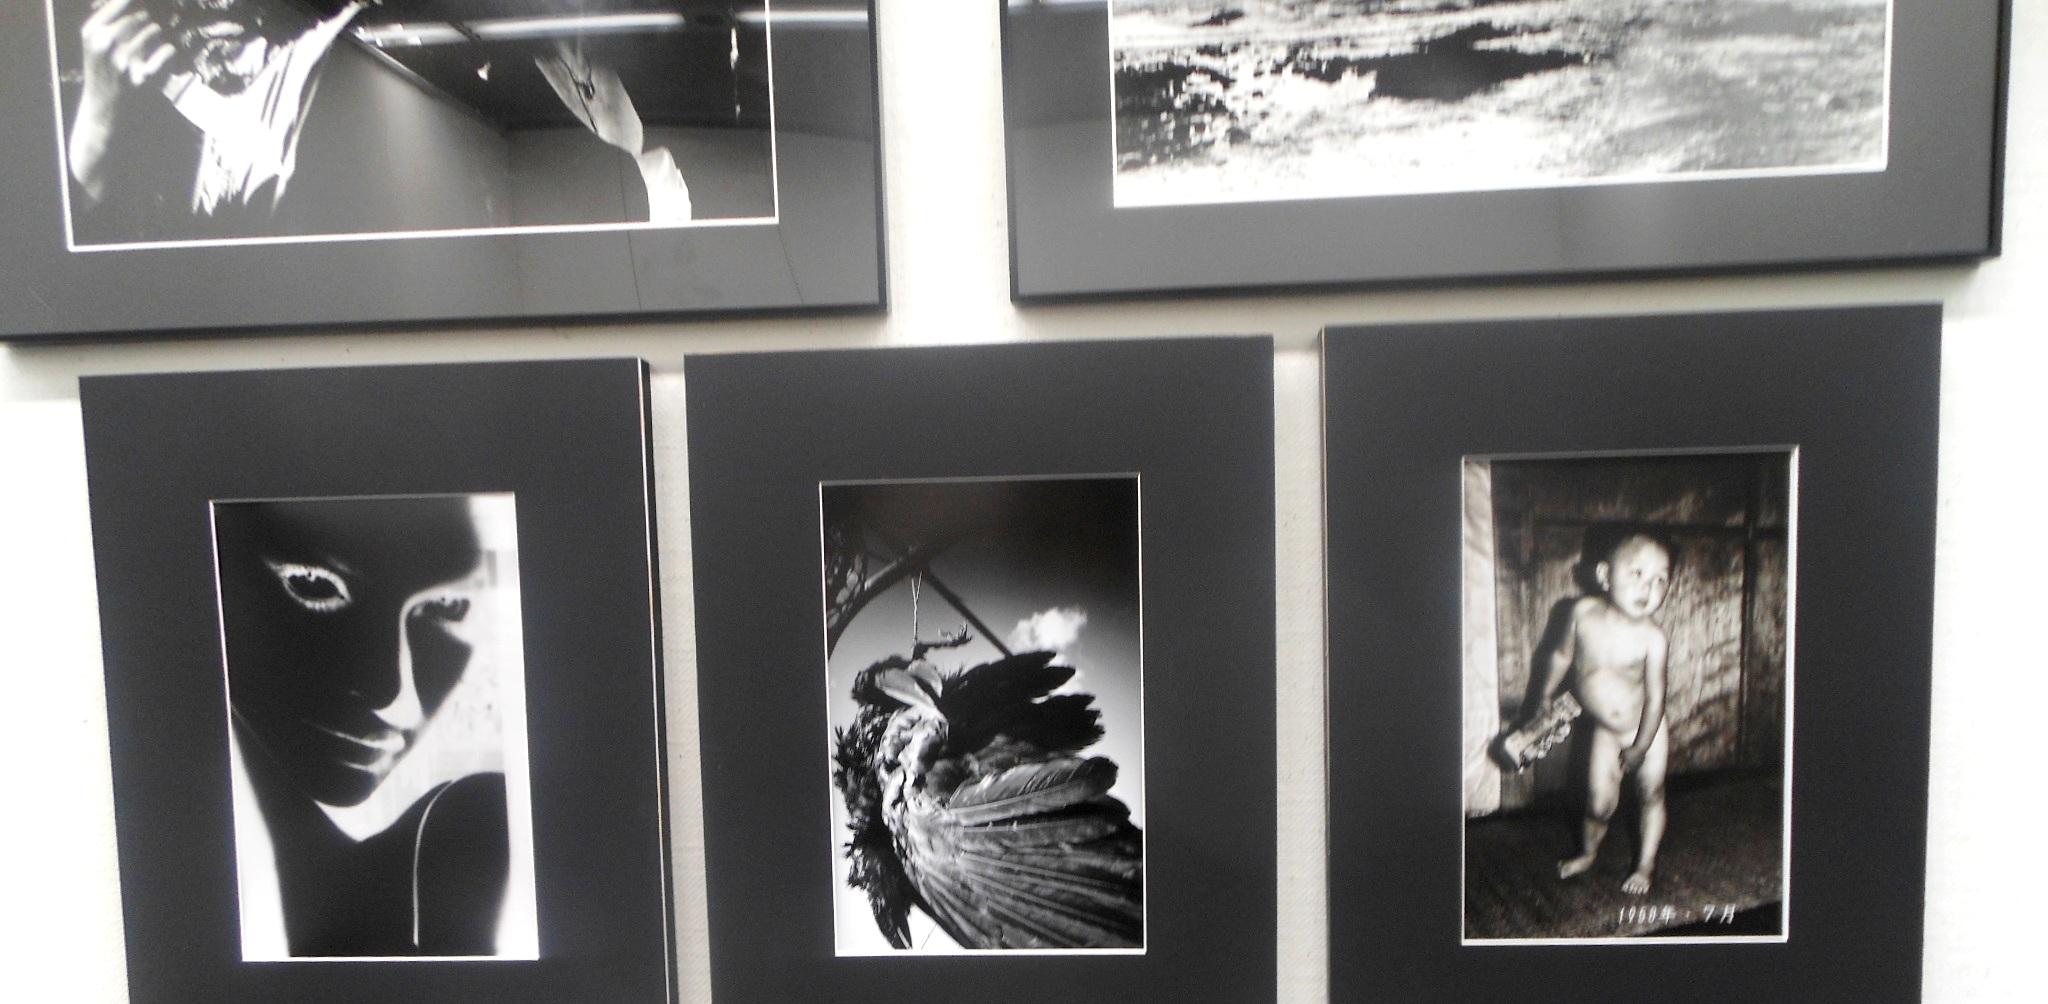 1885)②「写真クラブ「BePHaT!!」 第9回作品展 『夢 Photo 2012』」市民g. 終了11月21日(水)~11月25日(日)_f0126829_22215419.jpg